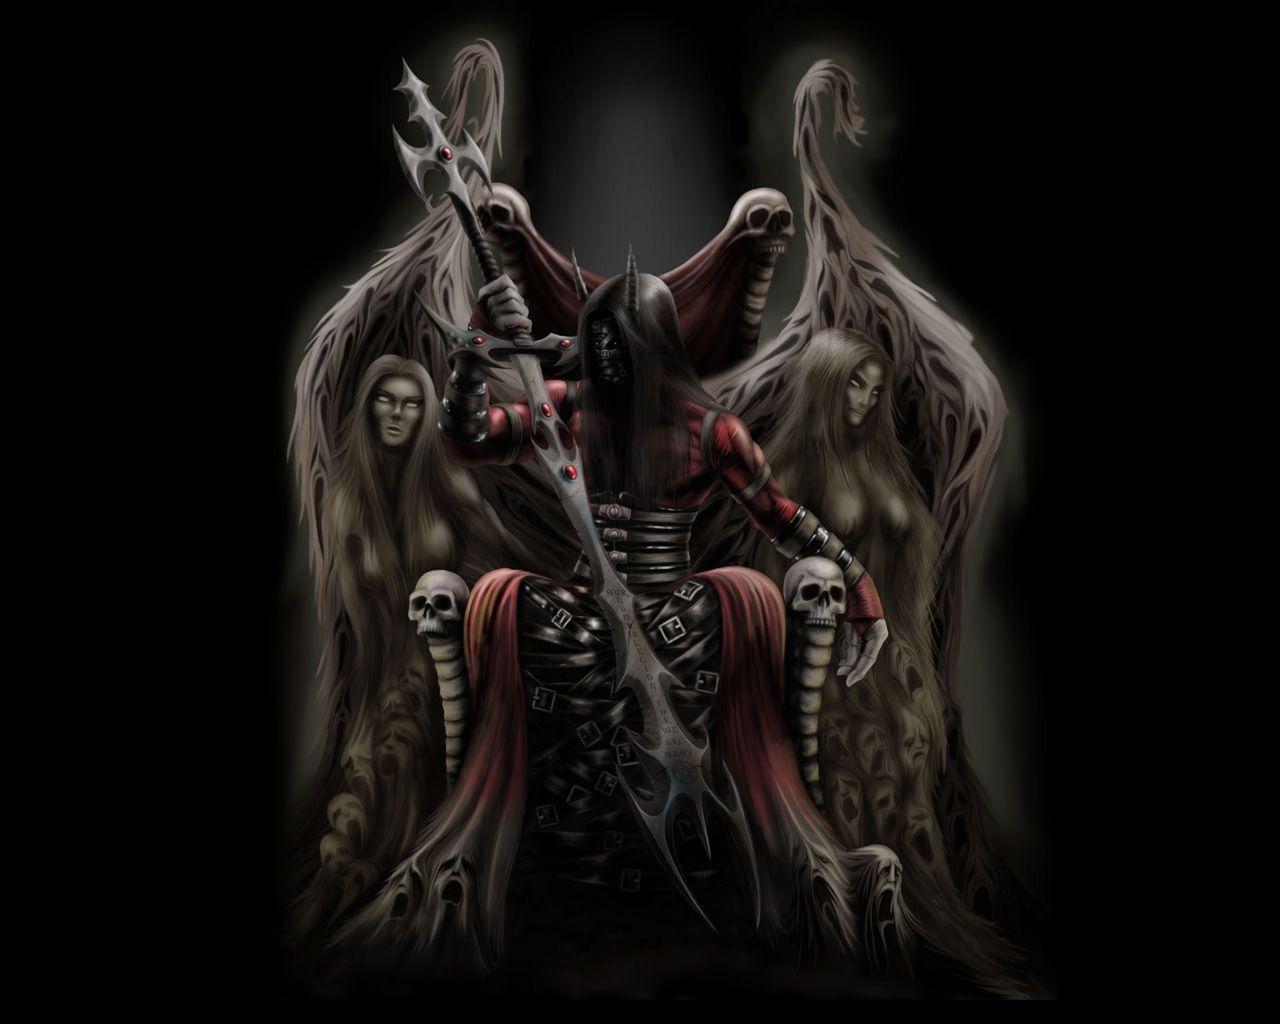 devil demon wallpaper - photo #27